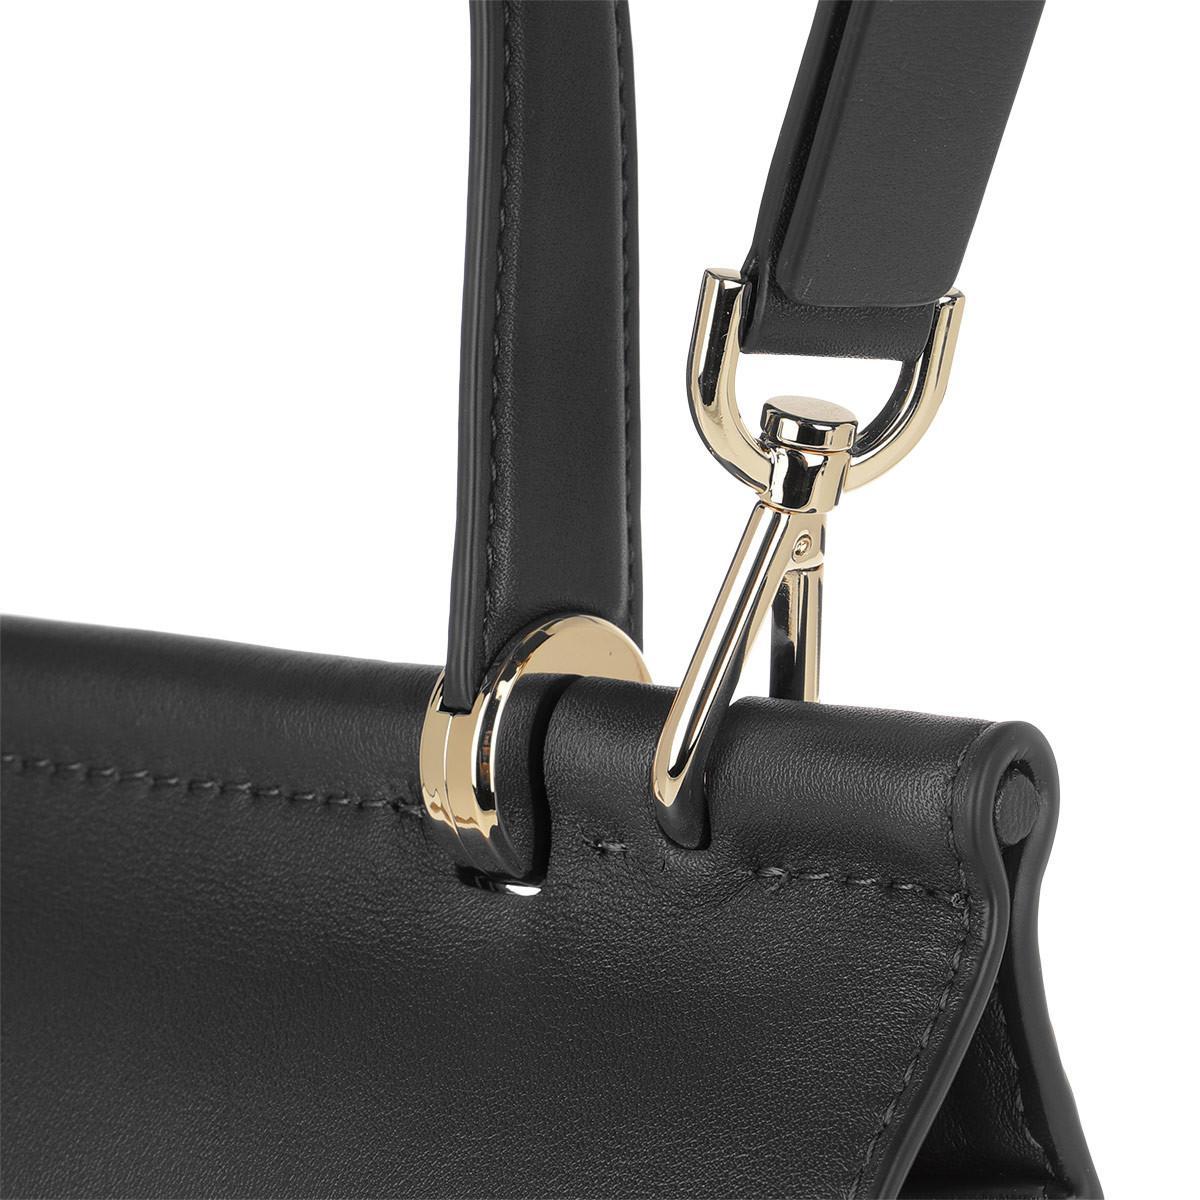 Michael Kors - Jasmine Md Th Satchel Bag Black gold - Lyst. View fullscreen b6da8e5df43c7